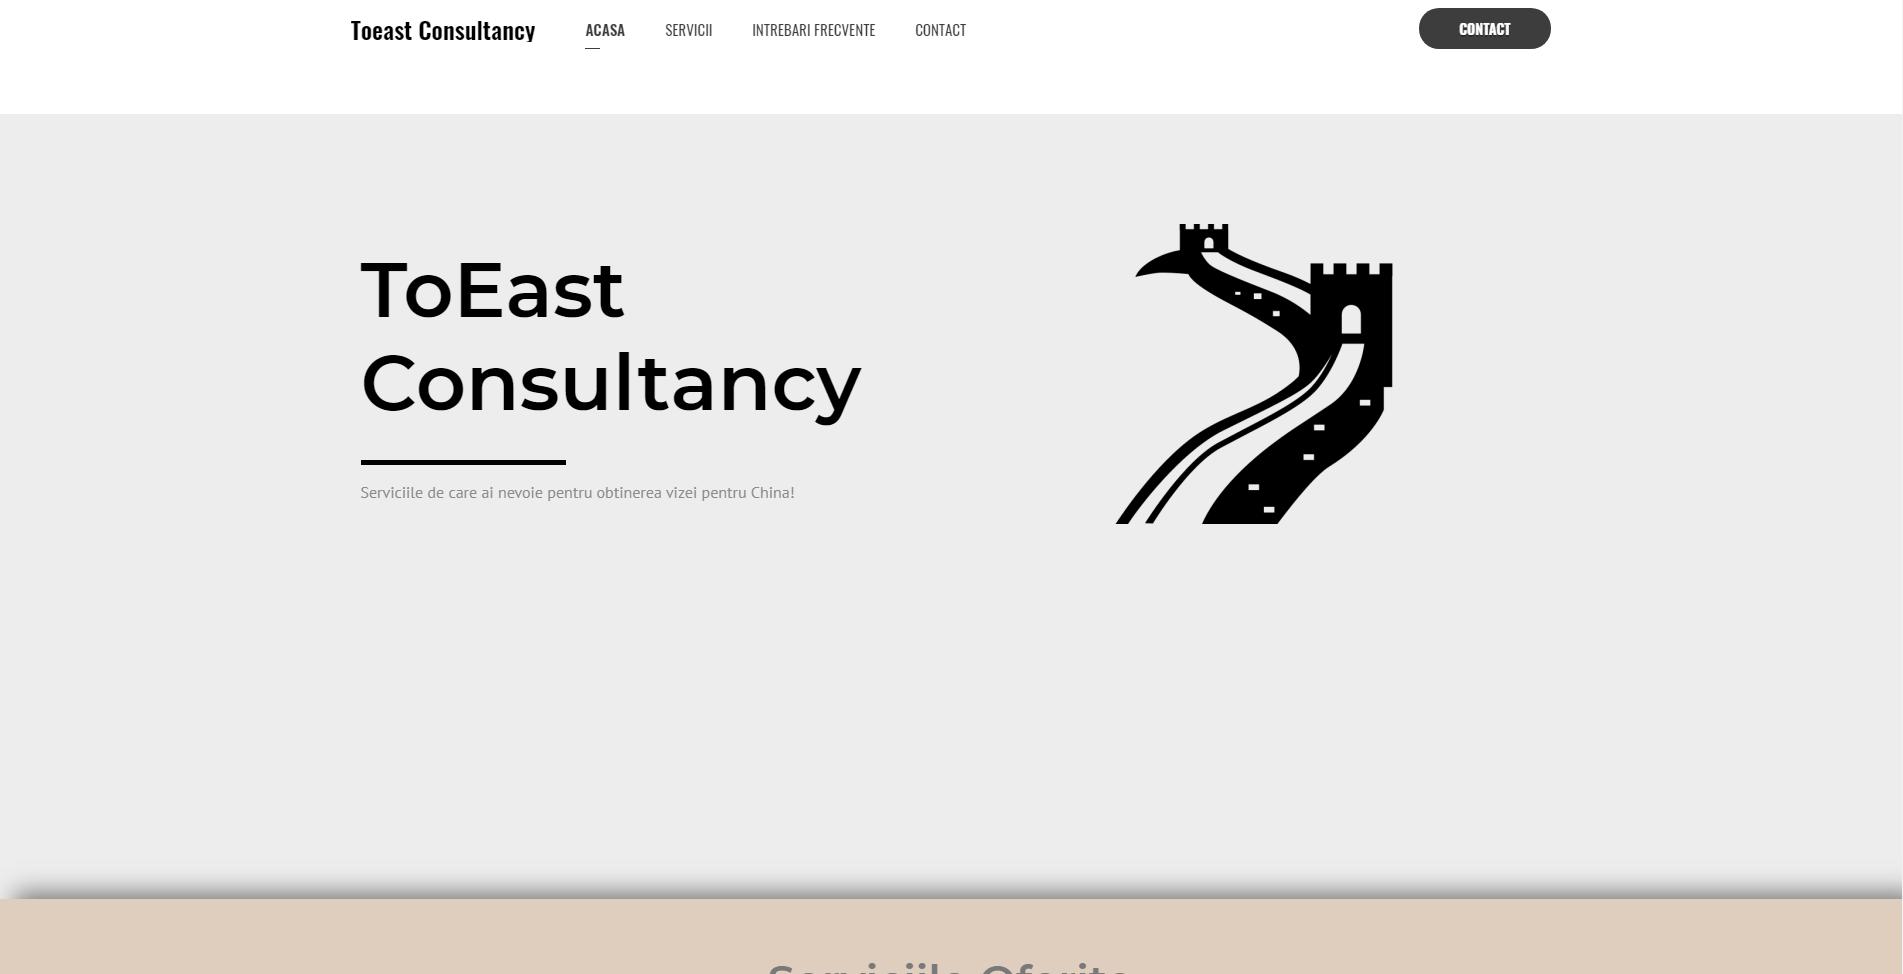 Toeast Consultancy